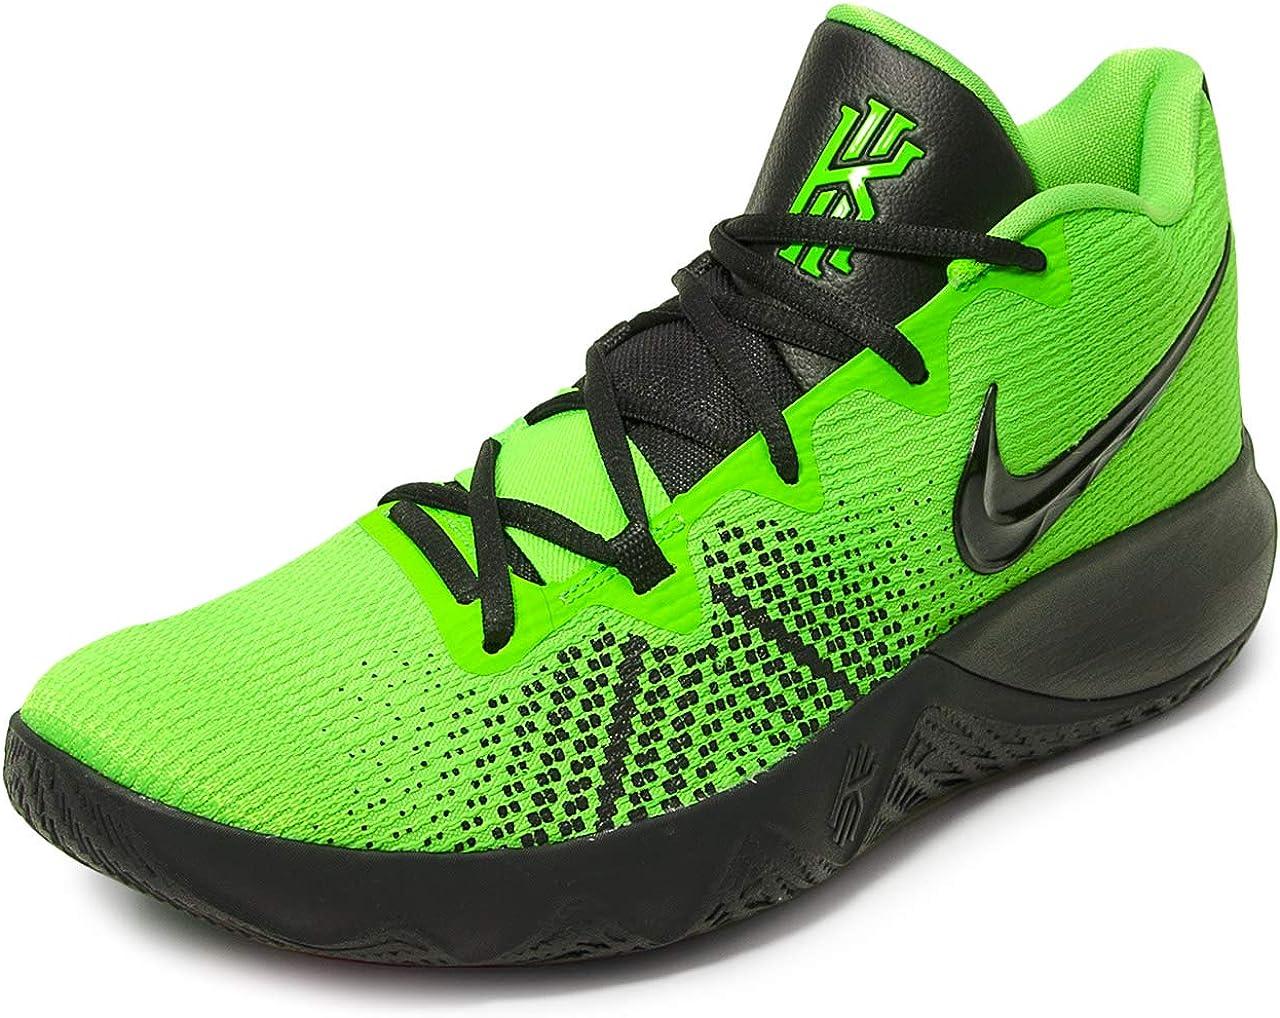 Nike Men's Kyrie Flytrap Rage Green